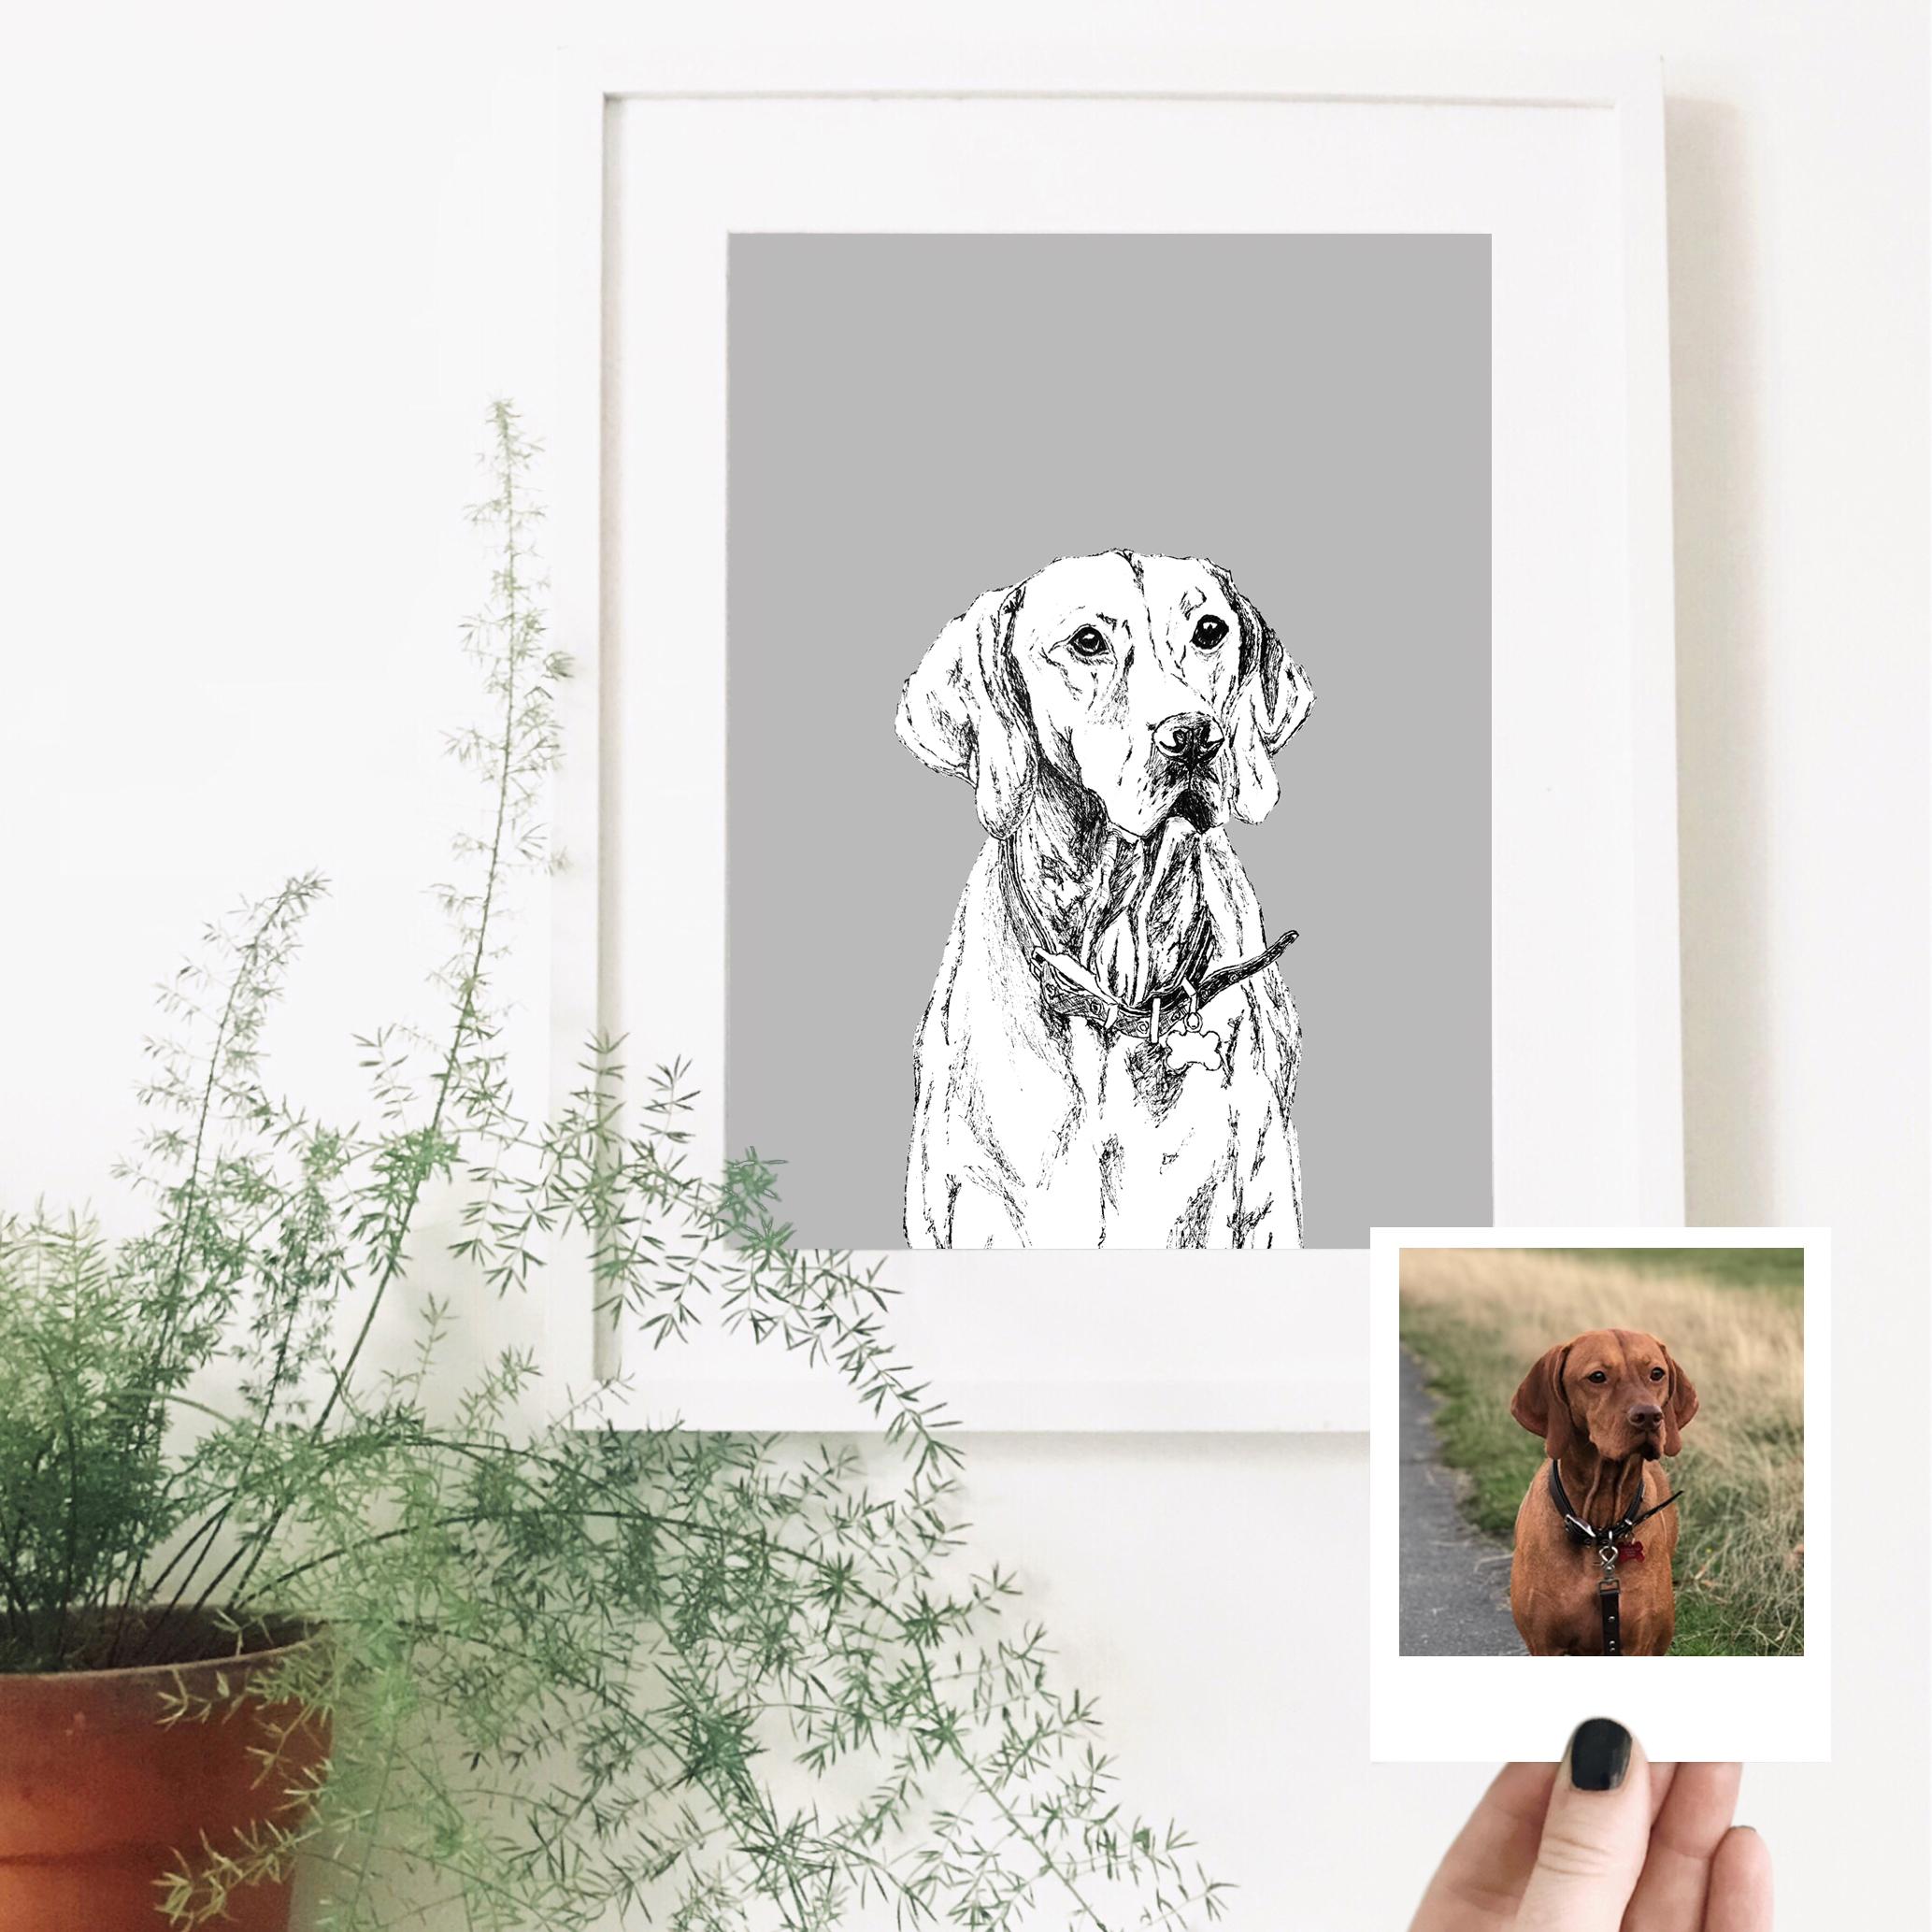 vizsla-pet-portrait-drawing.jpg